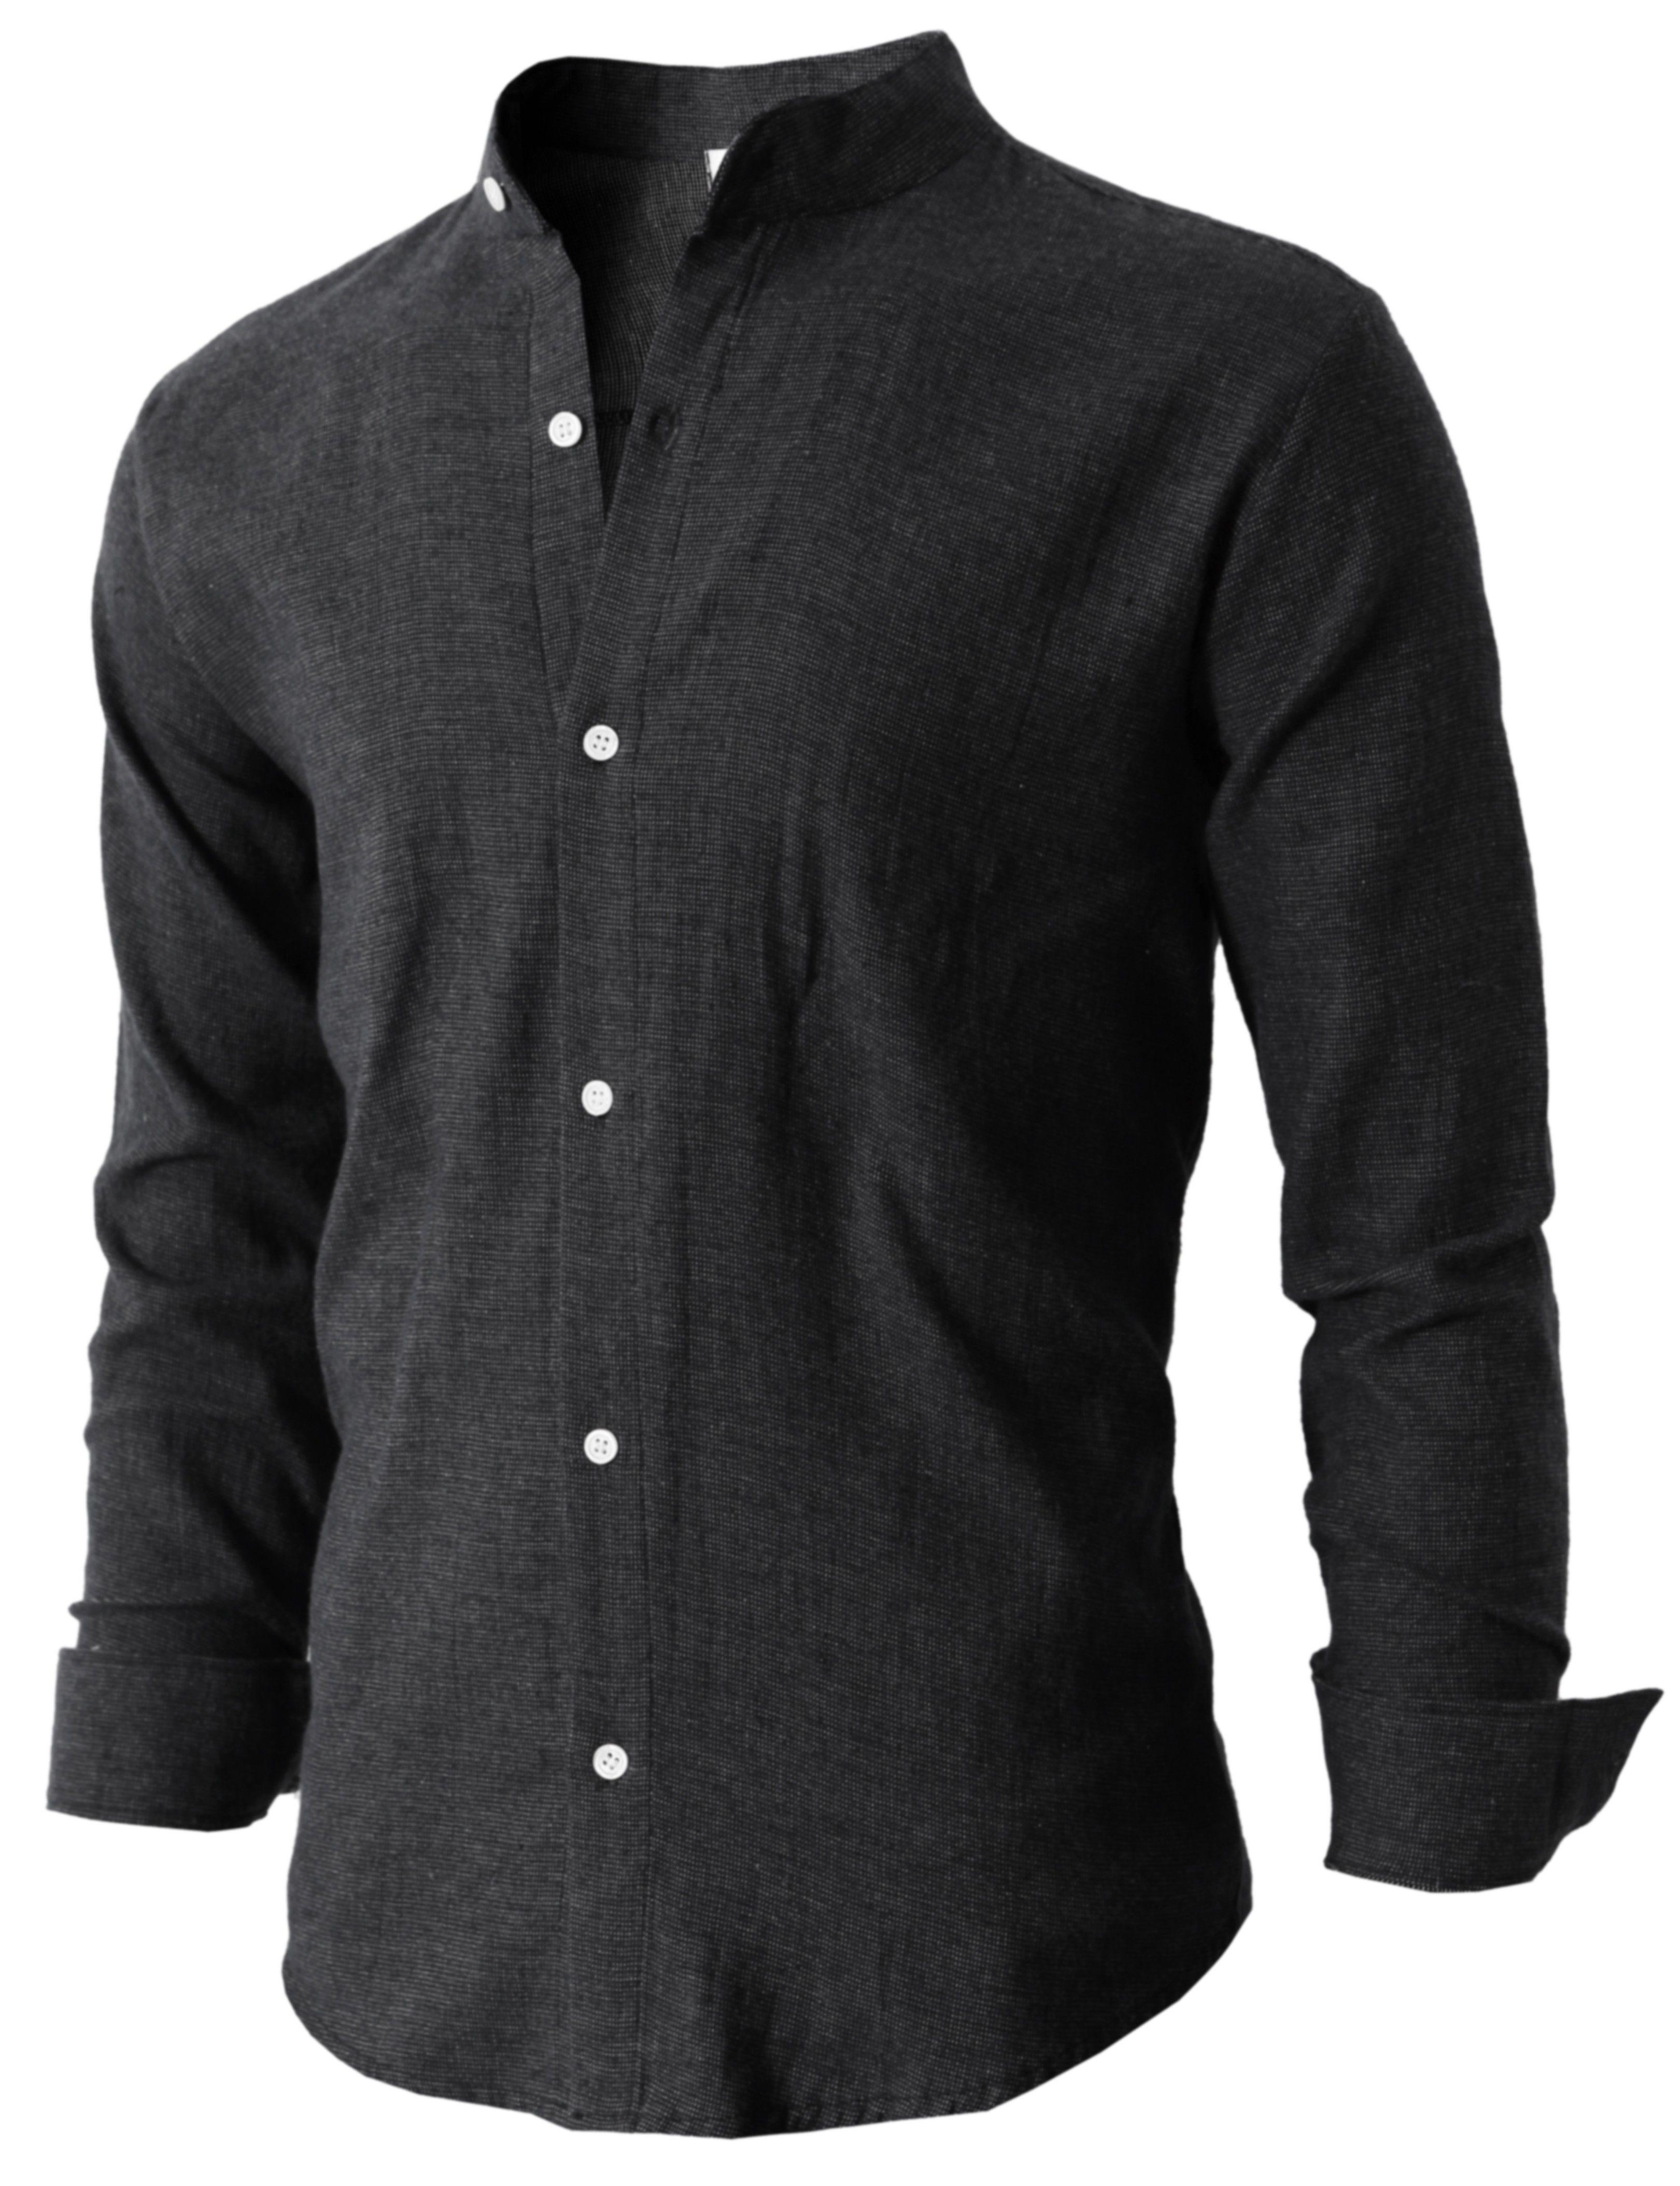 Mandarin collar flannel  Mens Basic Mandarin Collar Flannel Shirt Comfortable Soft Cotton